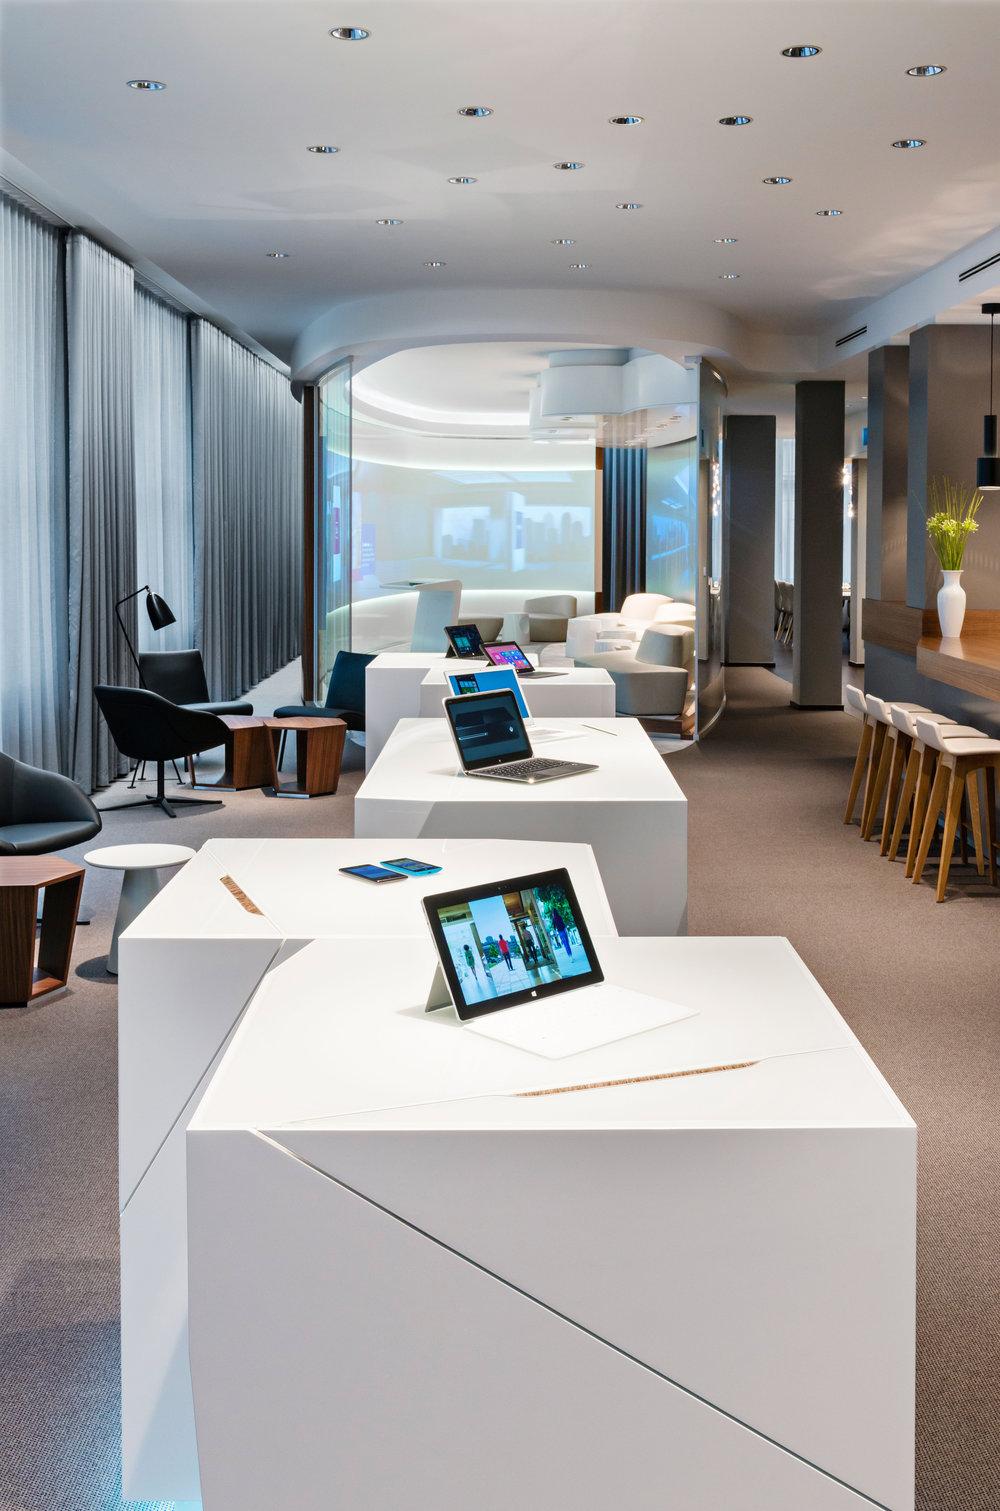 microsoft-center_coorporate-interior-design_coordination-berlin_11.jpg